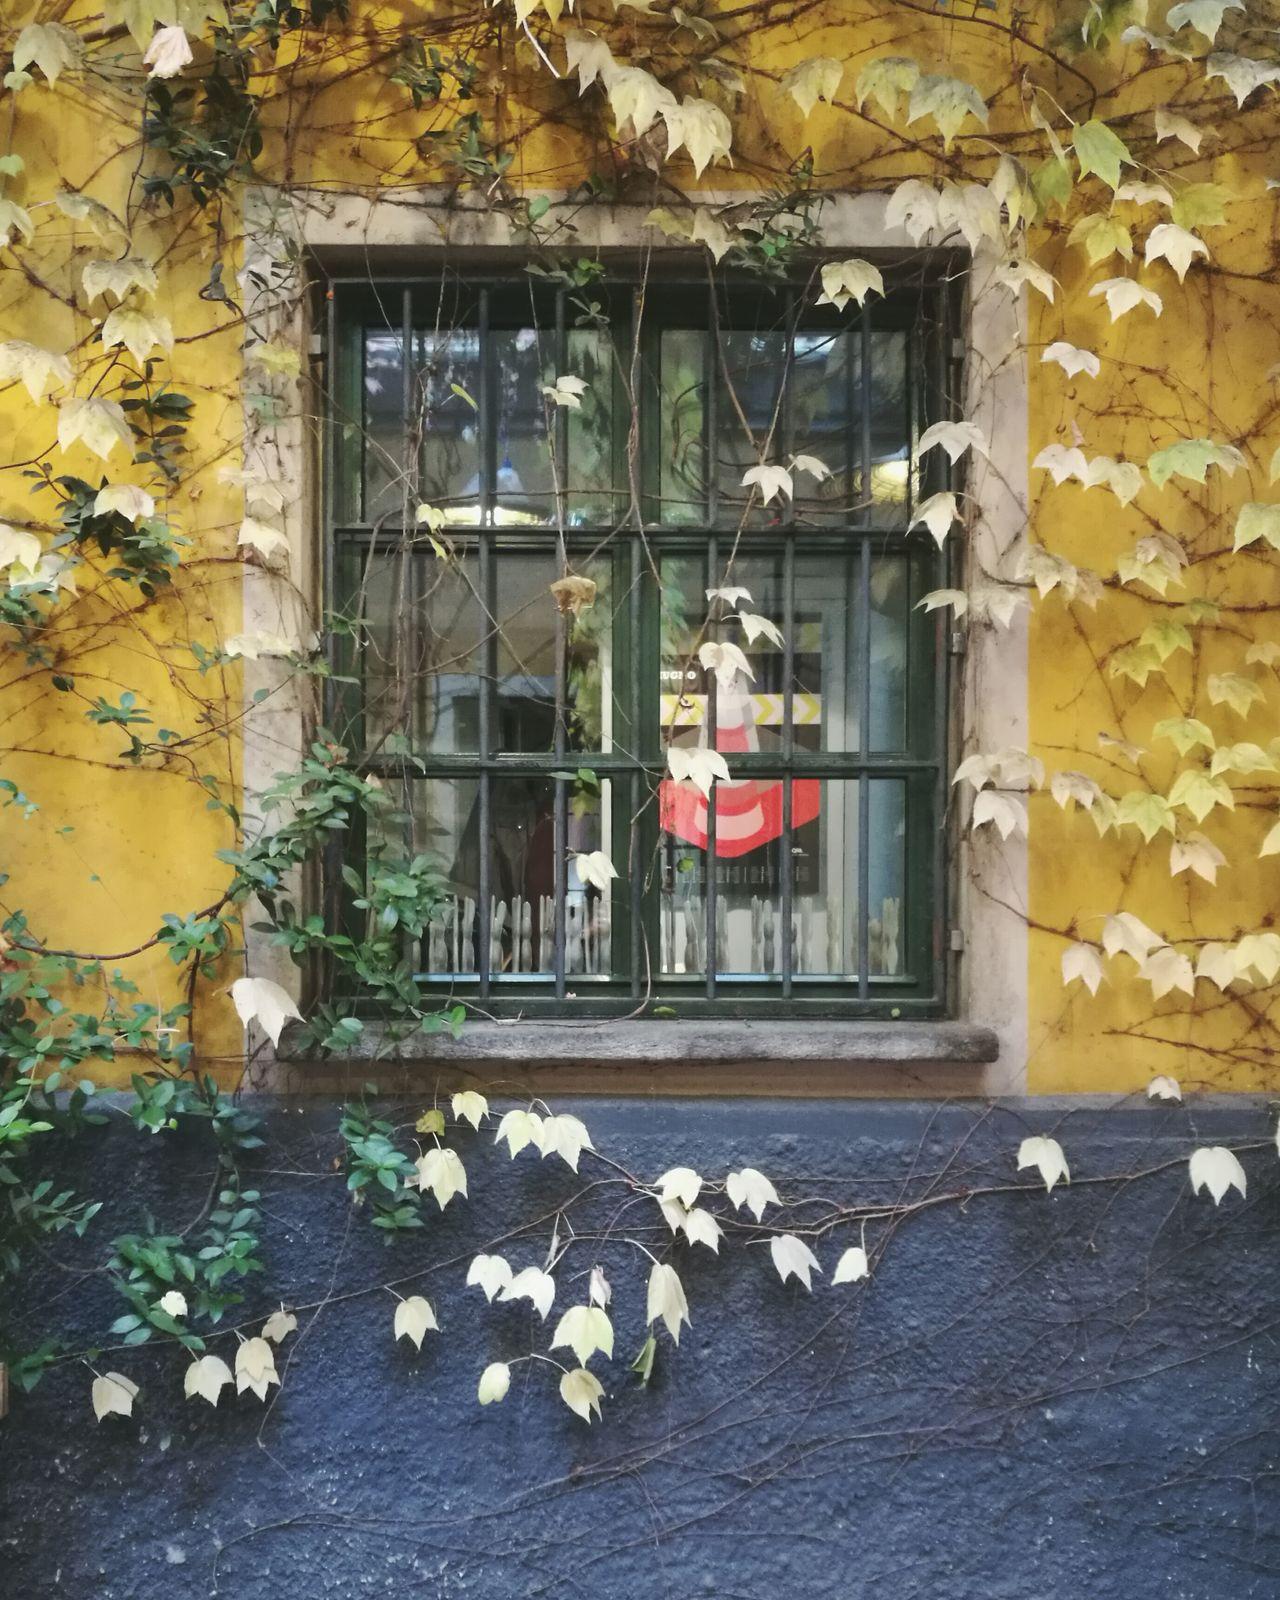 Carla Sozzani Milano Window Outdoors Plant Art Gallery Beutiful  Nature Collection